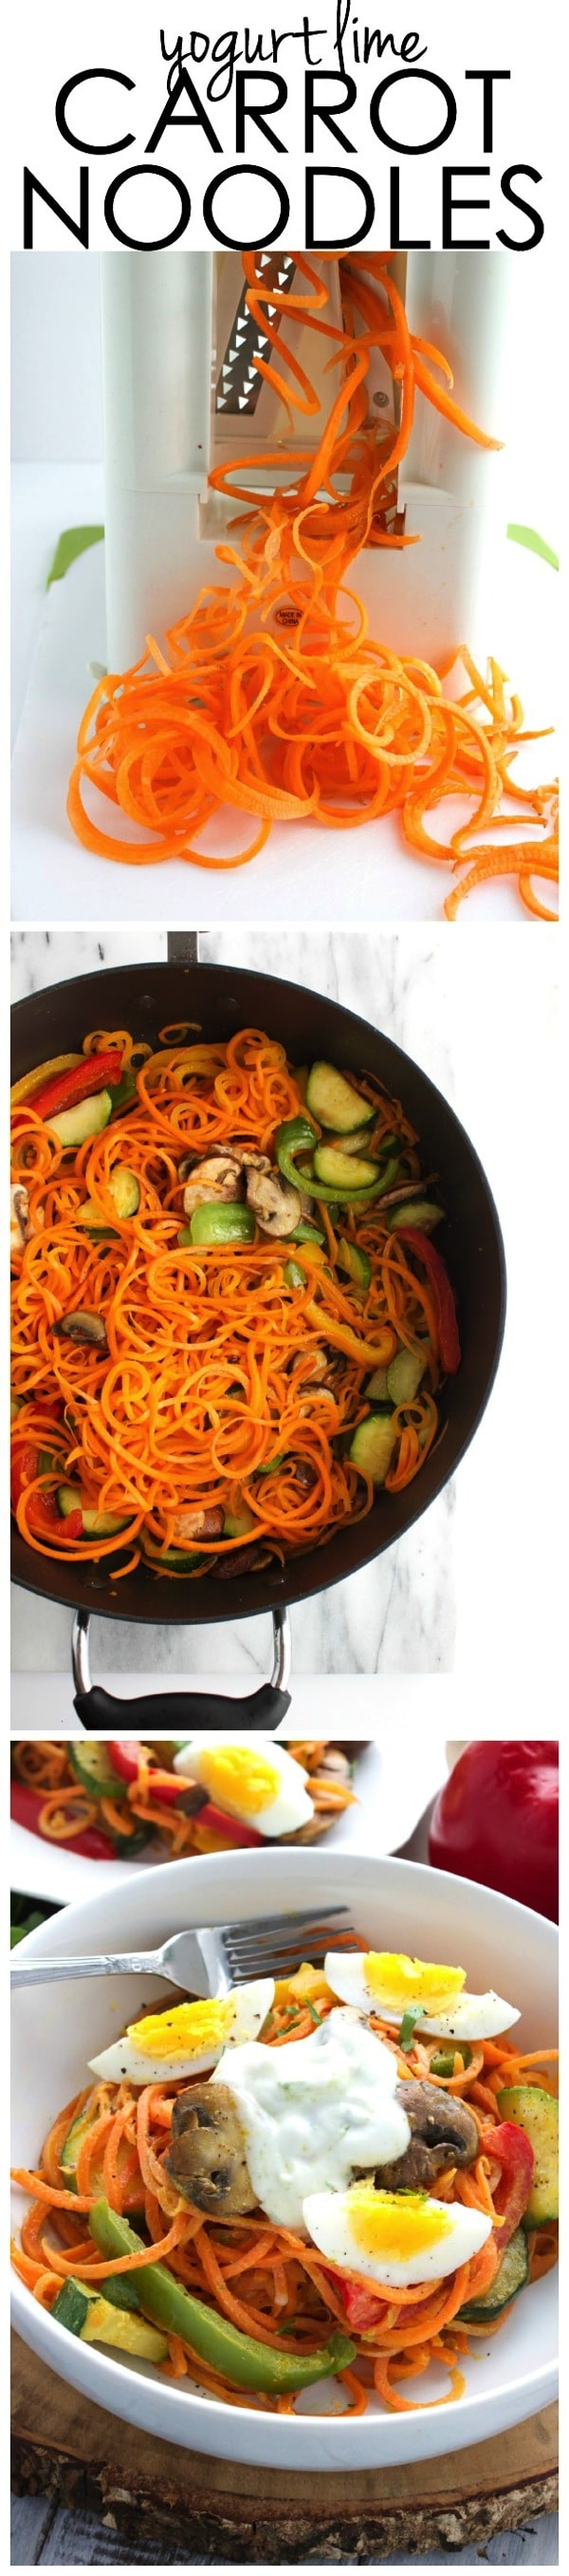 Yogurt Lime Carrot Noodles 123